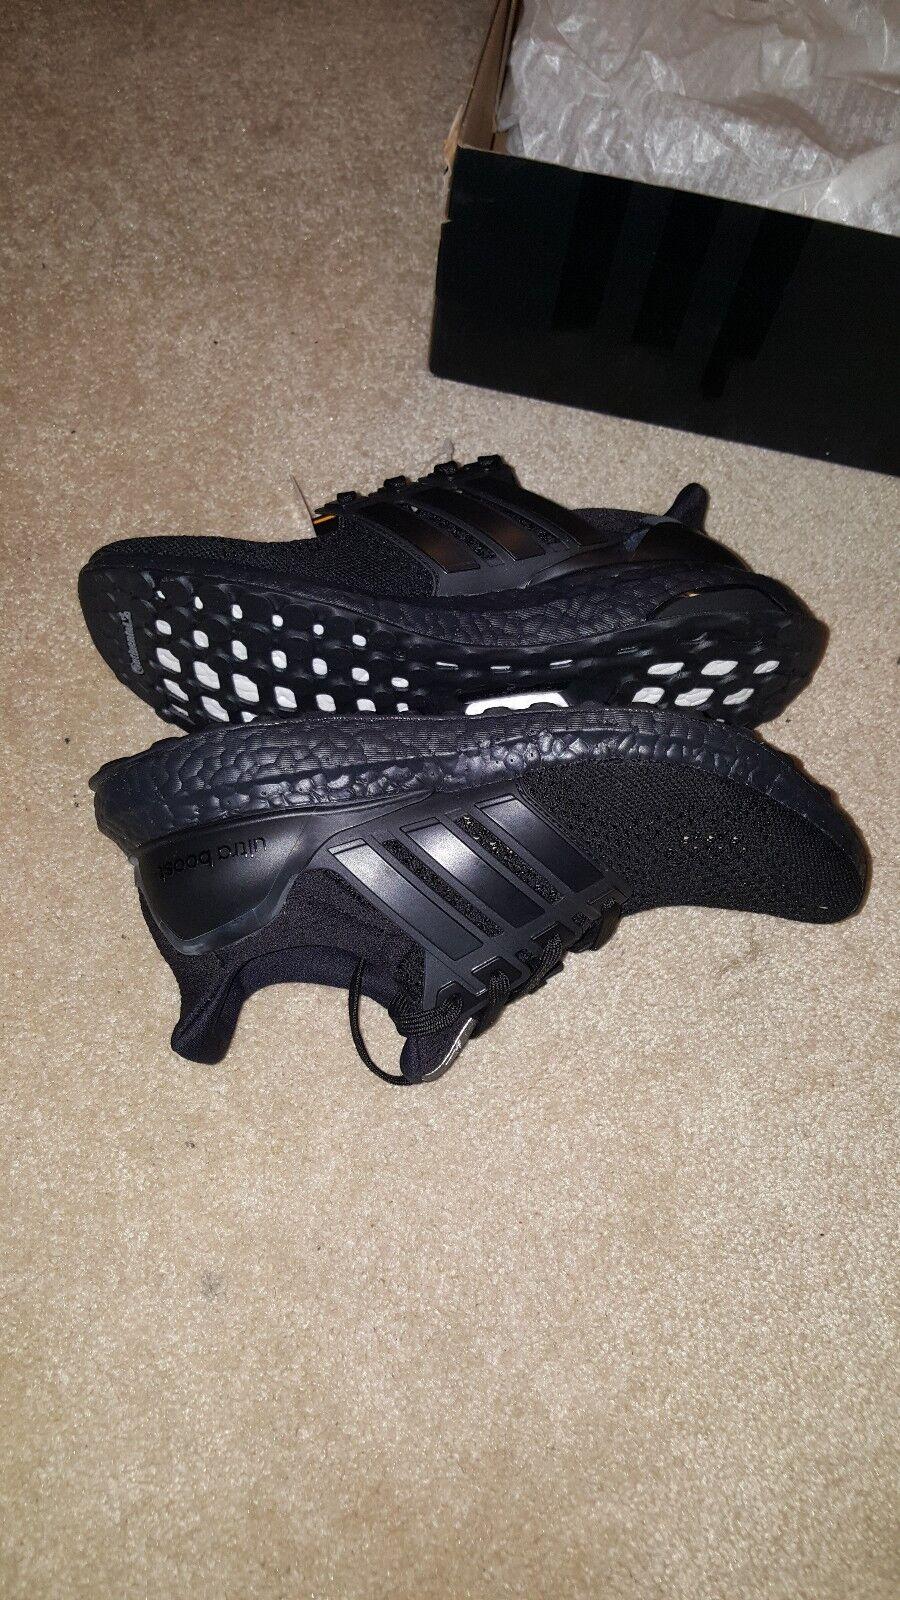 Adidas impuls - impuls Adidas - schwarzer ds 1.0 9e5d66